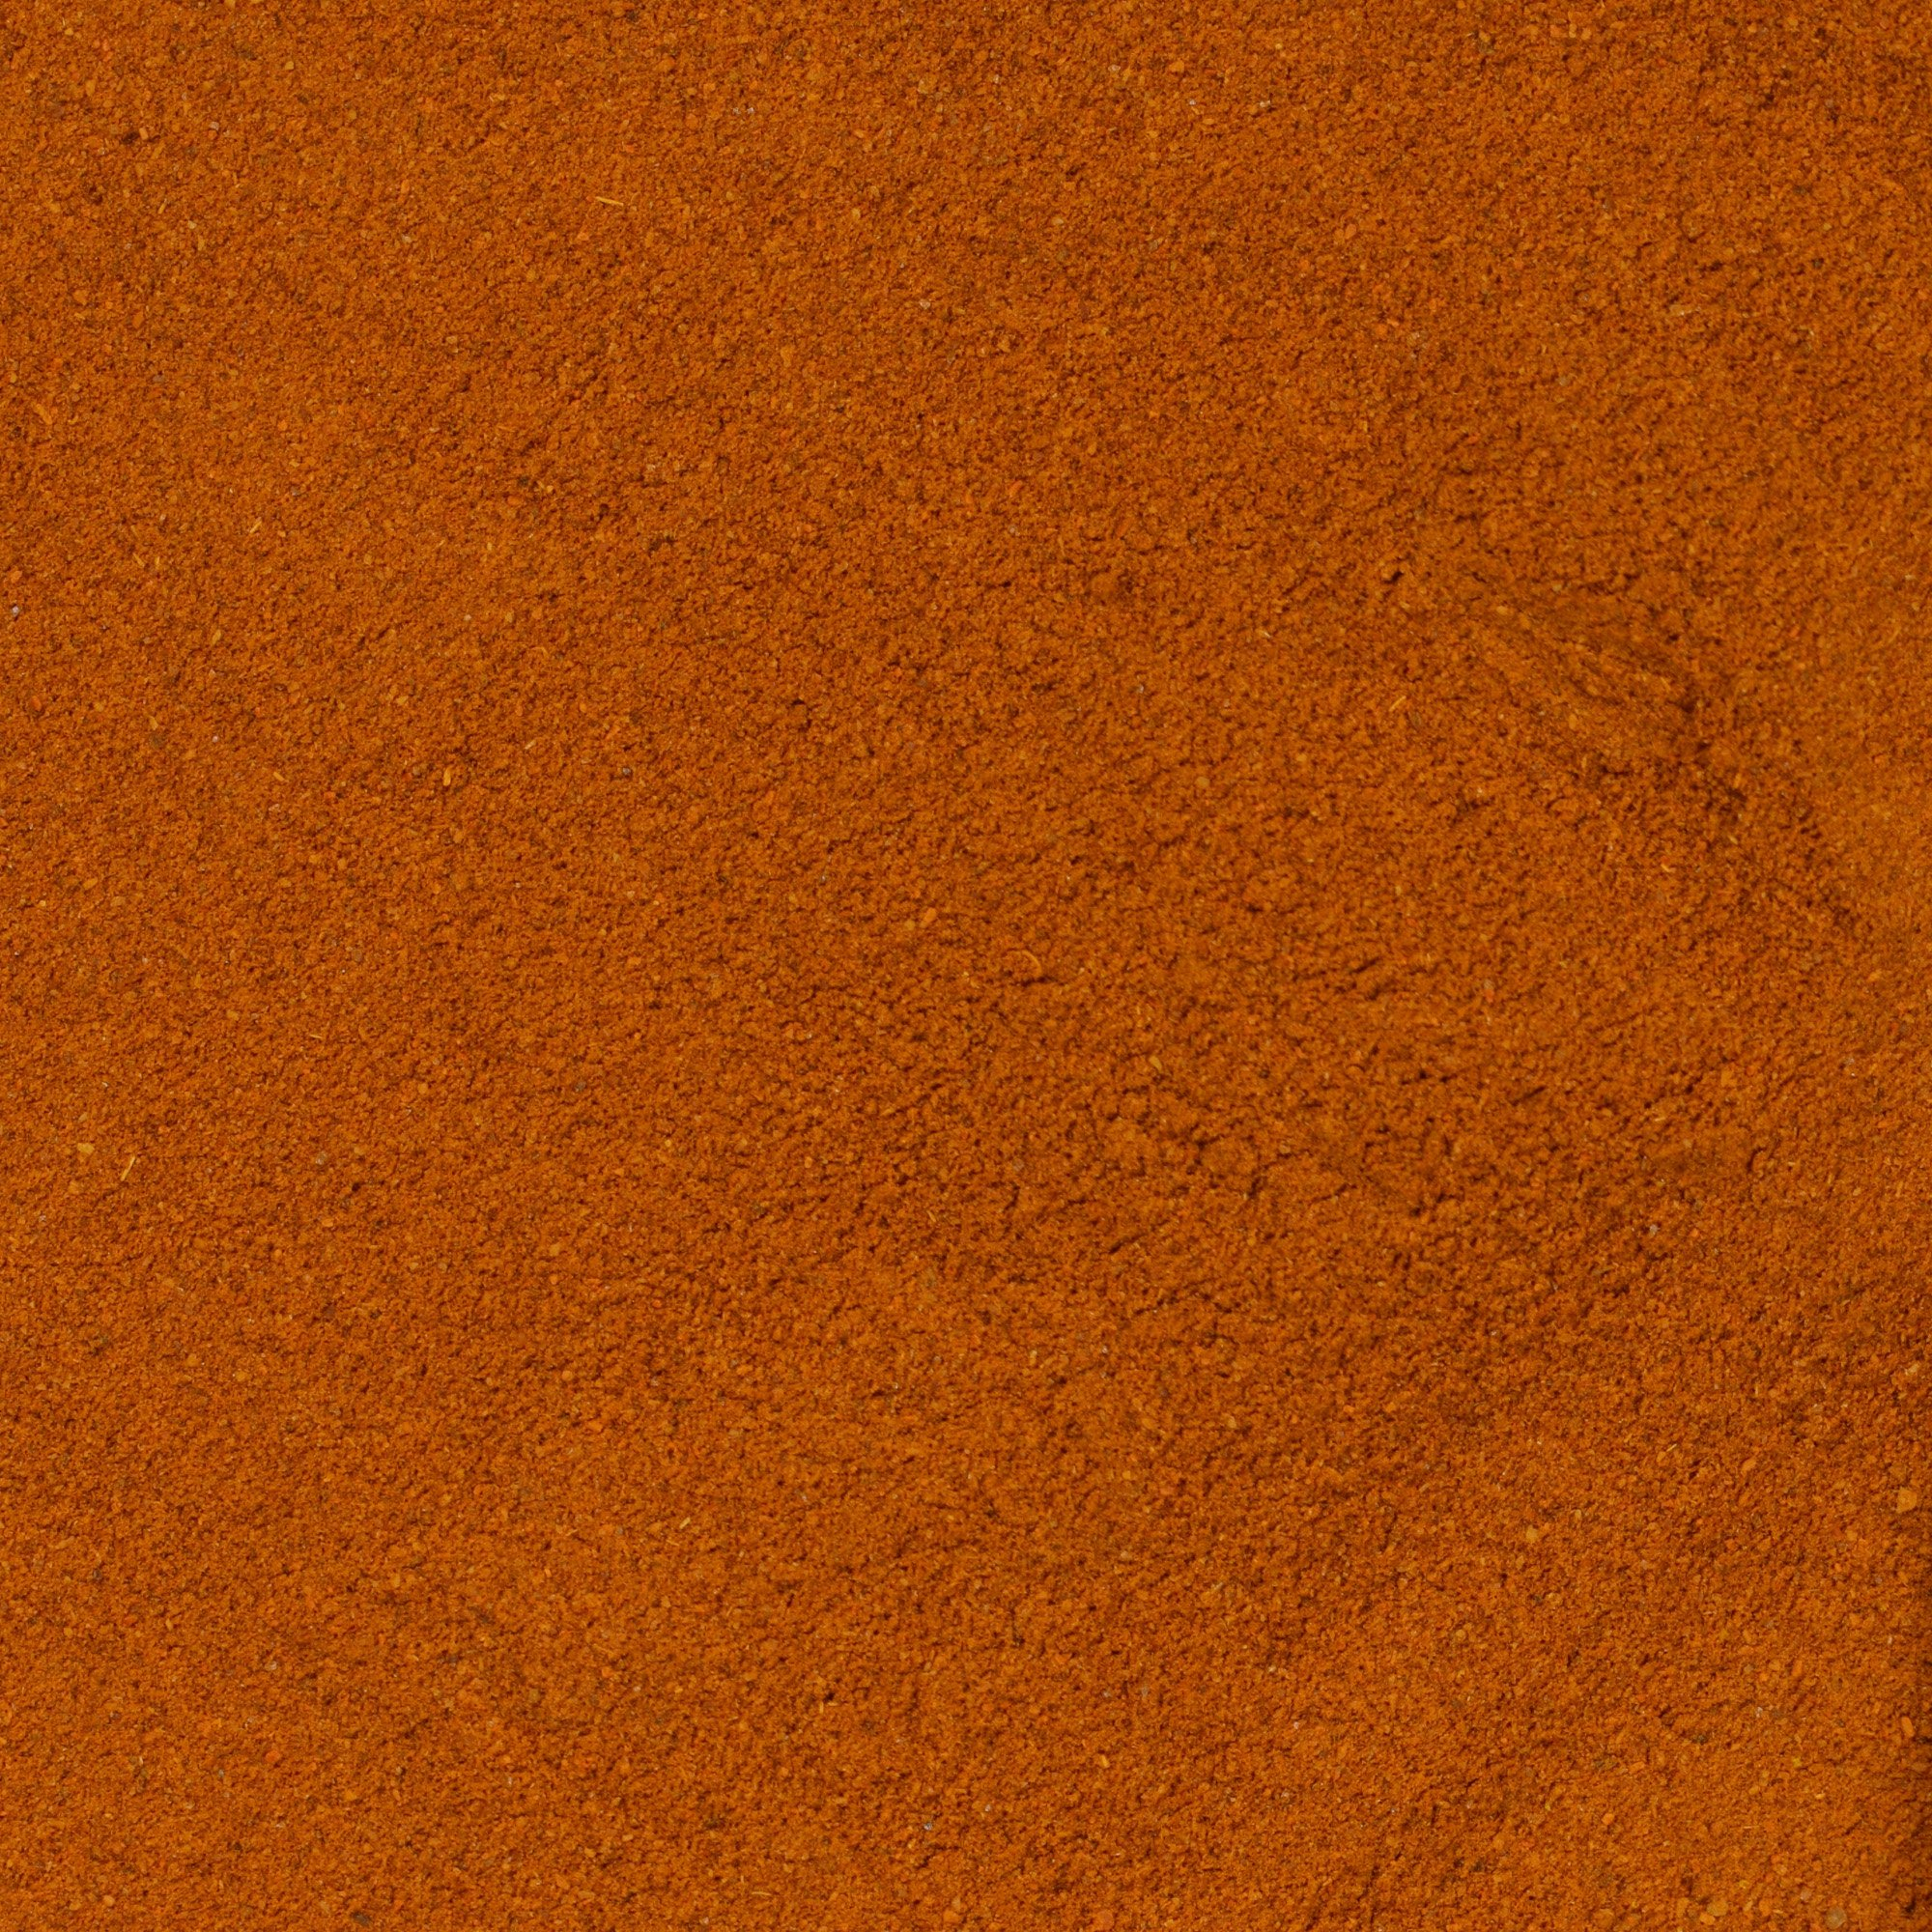 The Spice Lab No. 91 - Scotch Bonnet Powder Spice - All Natural Kosher Non GMO Gluten Free Spice - 1 lb Resealable Bag